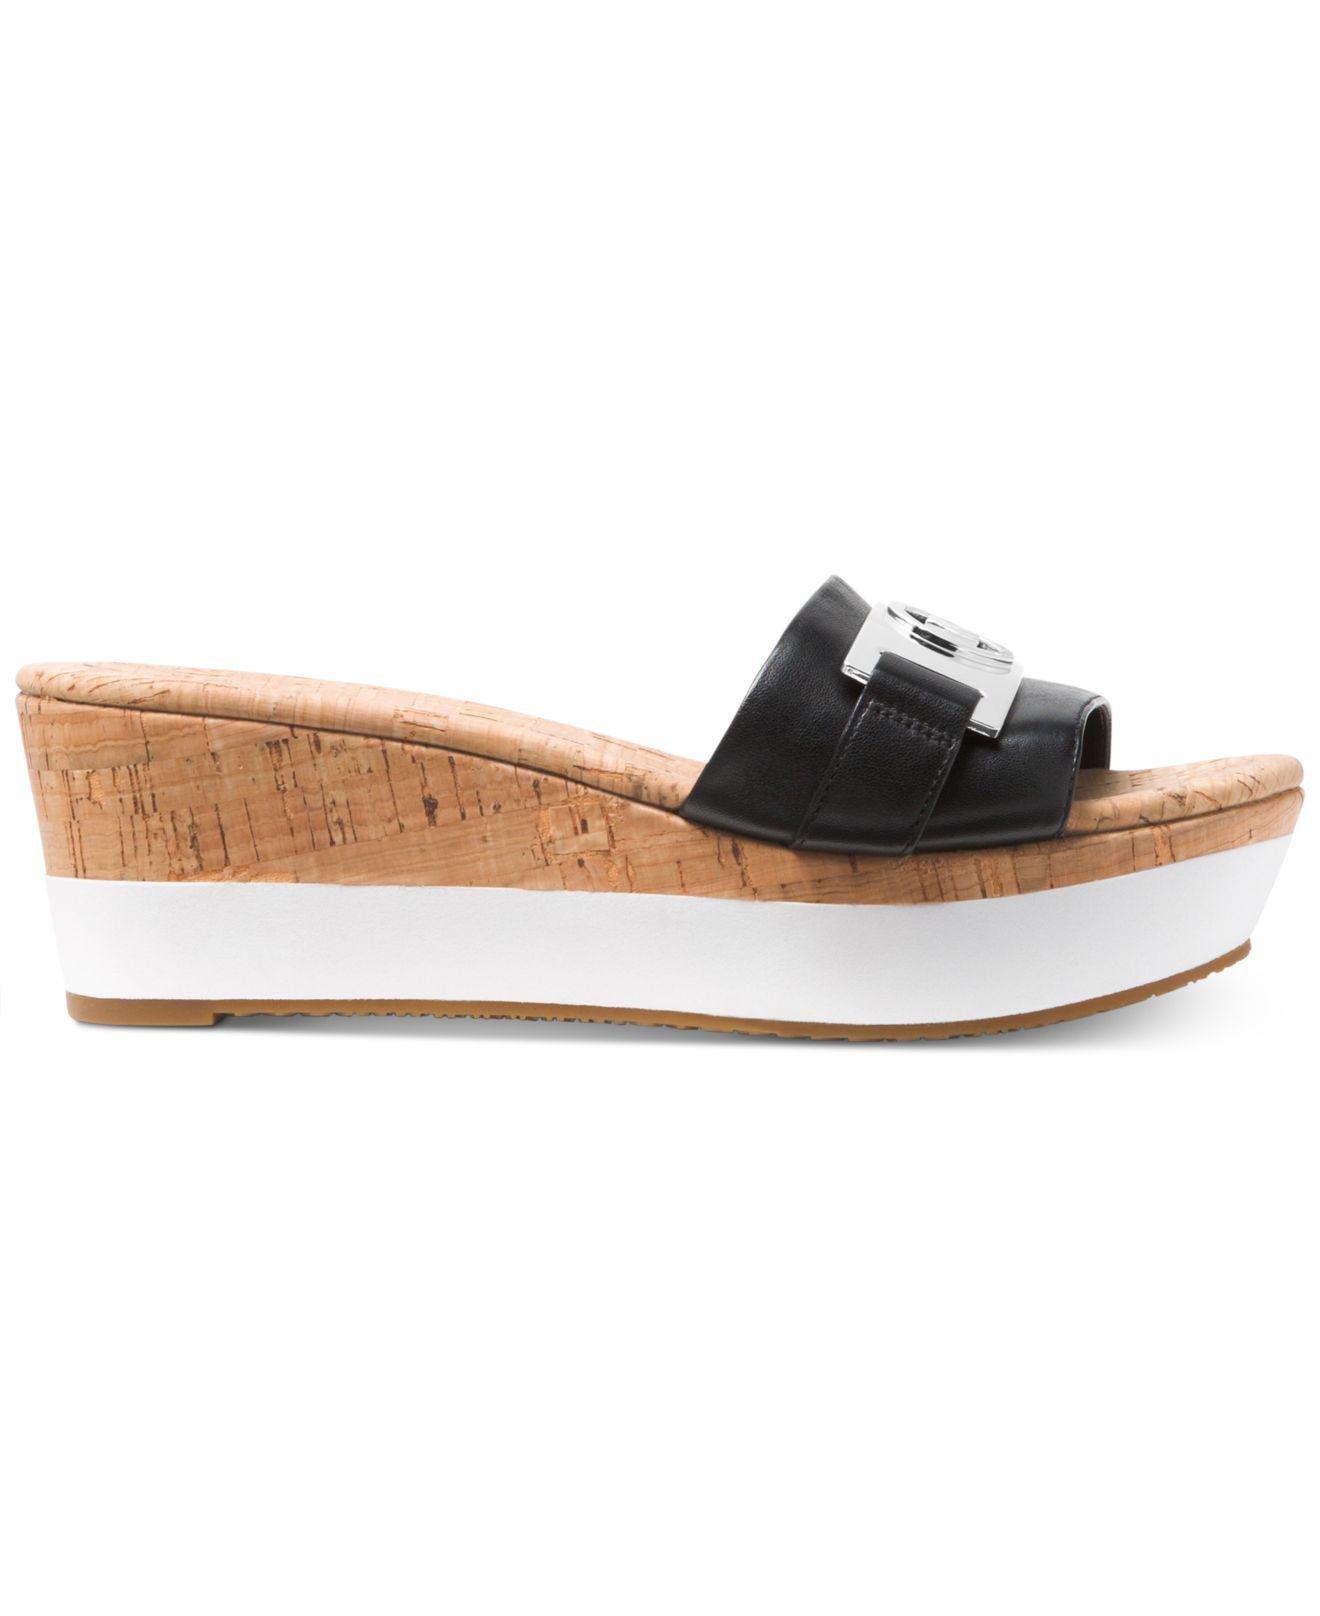 b17d137a7f1 Michael Kors Michael Warren Platform Wedge Sandals in Black - Save 3% - Lyst